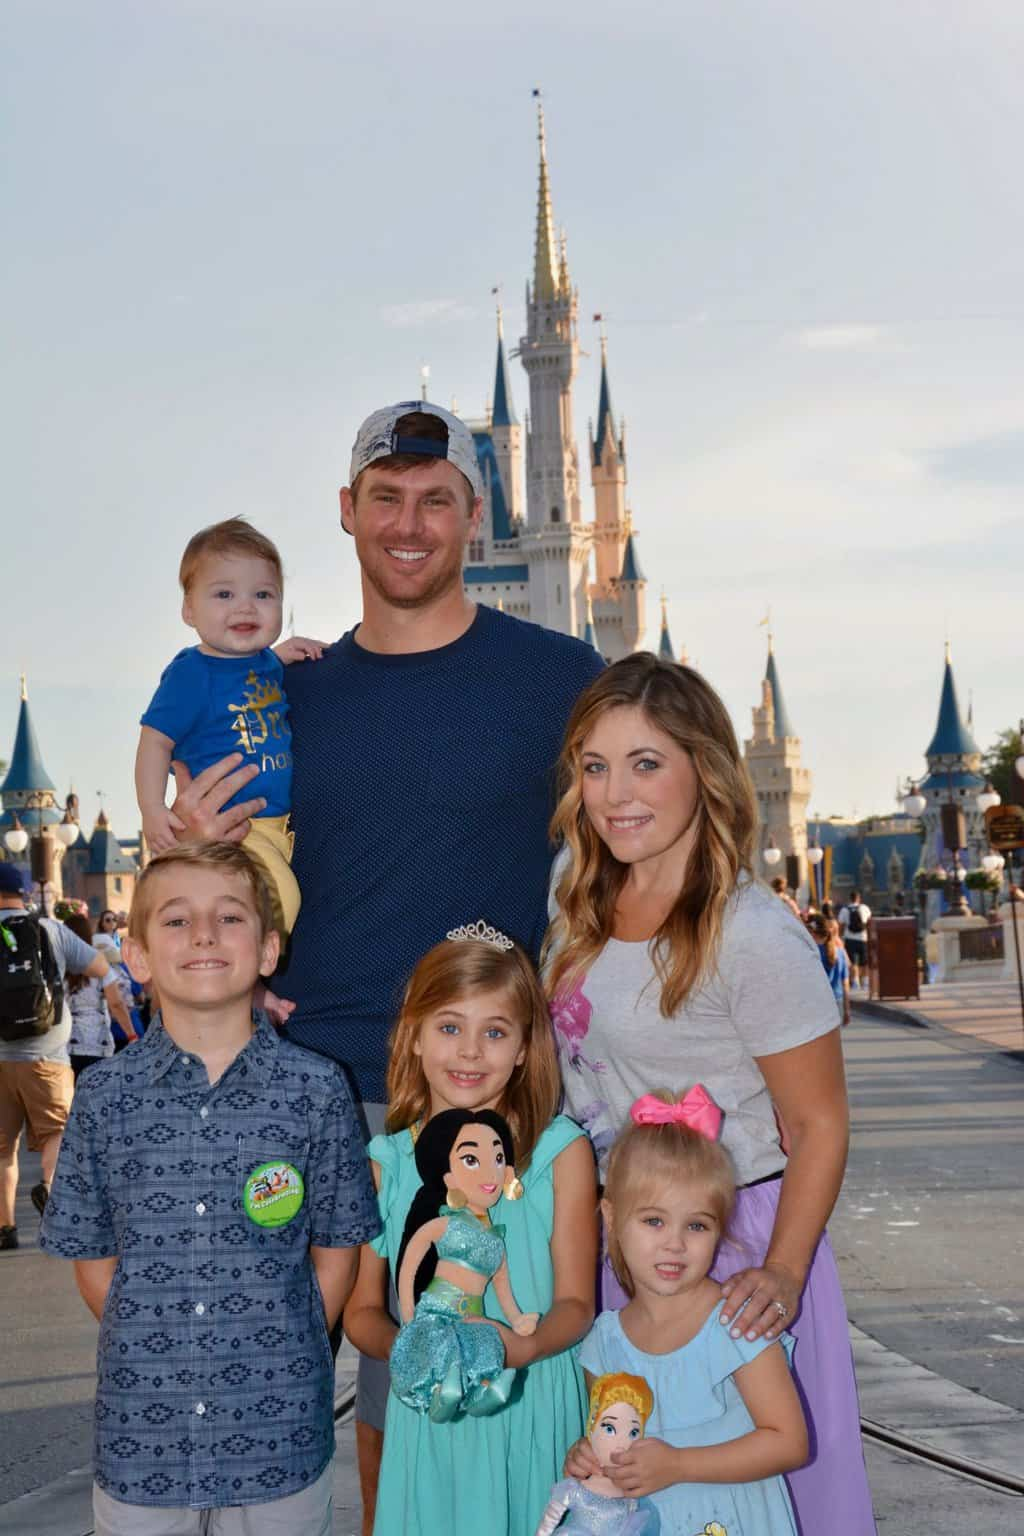 Best Place for Castle Pics at Disney